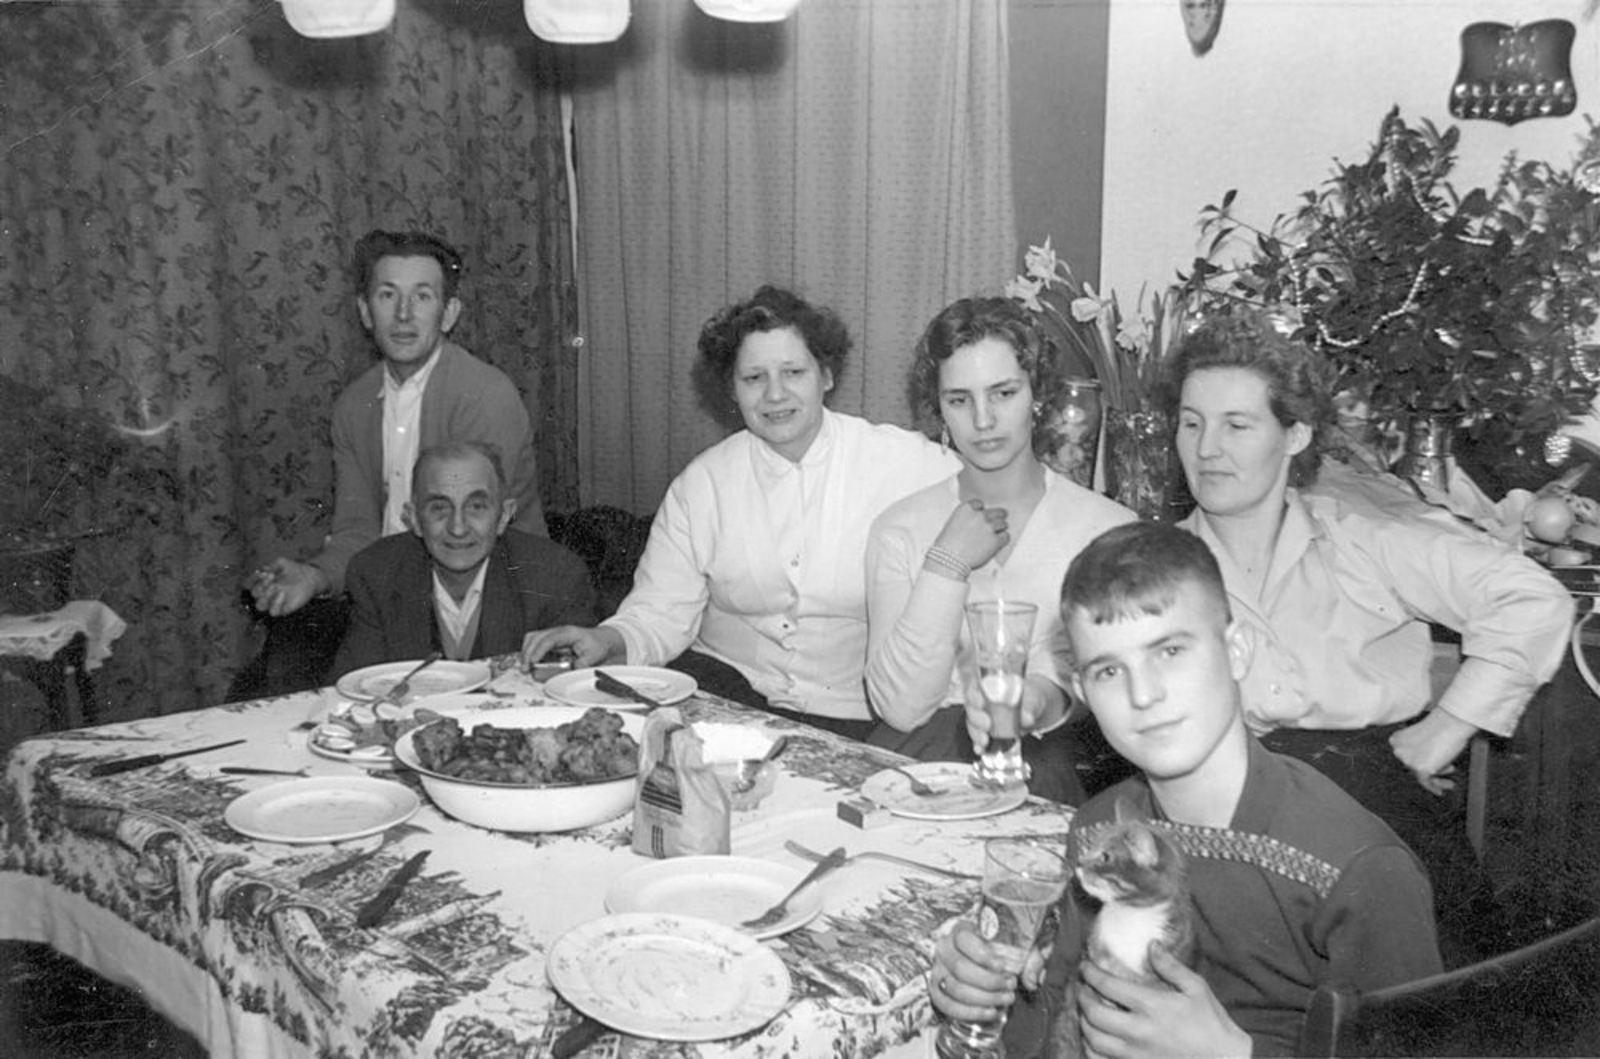 Imanse Iman C 1920 1957 met Buren vd Kommer 02